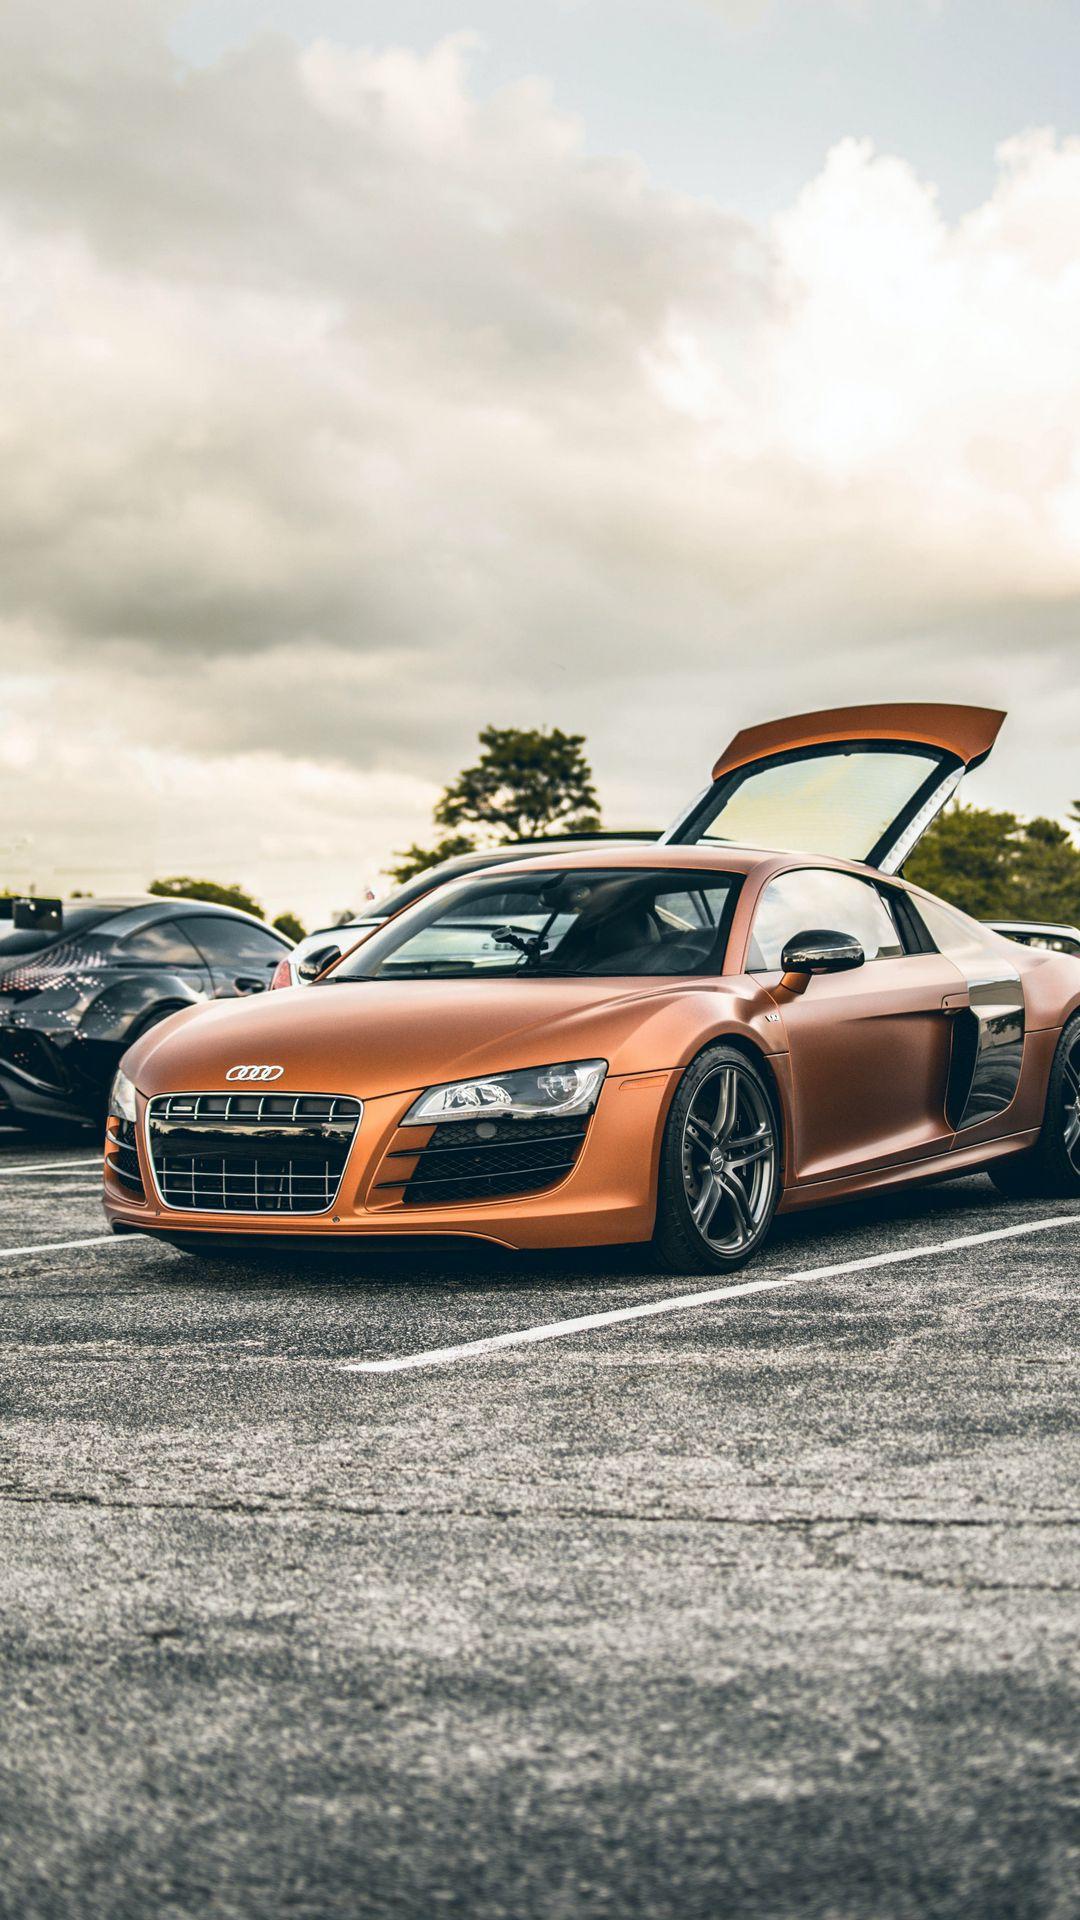 Audi TT Tunning Wallpapers Free Download